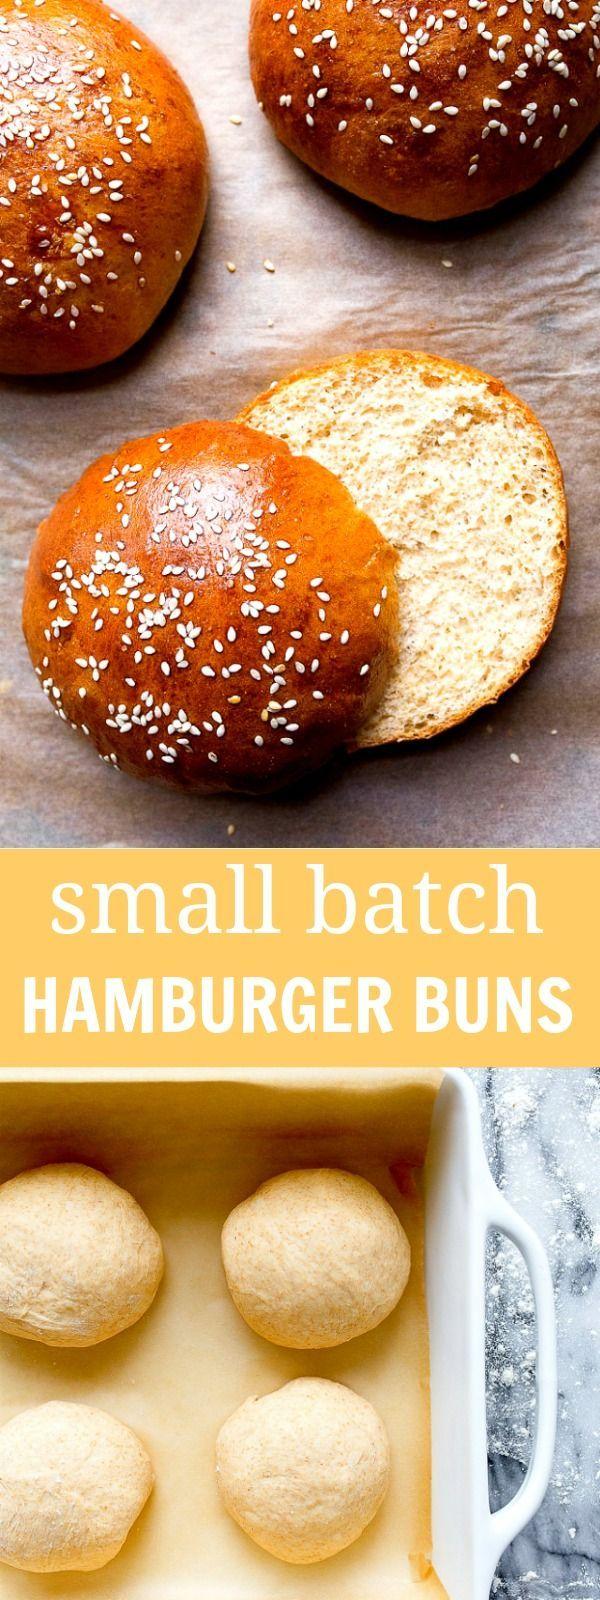 Homemade hamburger buns with whole wheat flour. Small batch bread recipe makes 4 buns. Brioche buns!